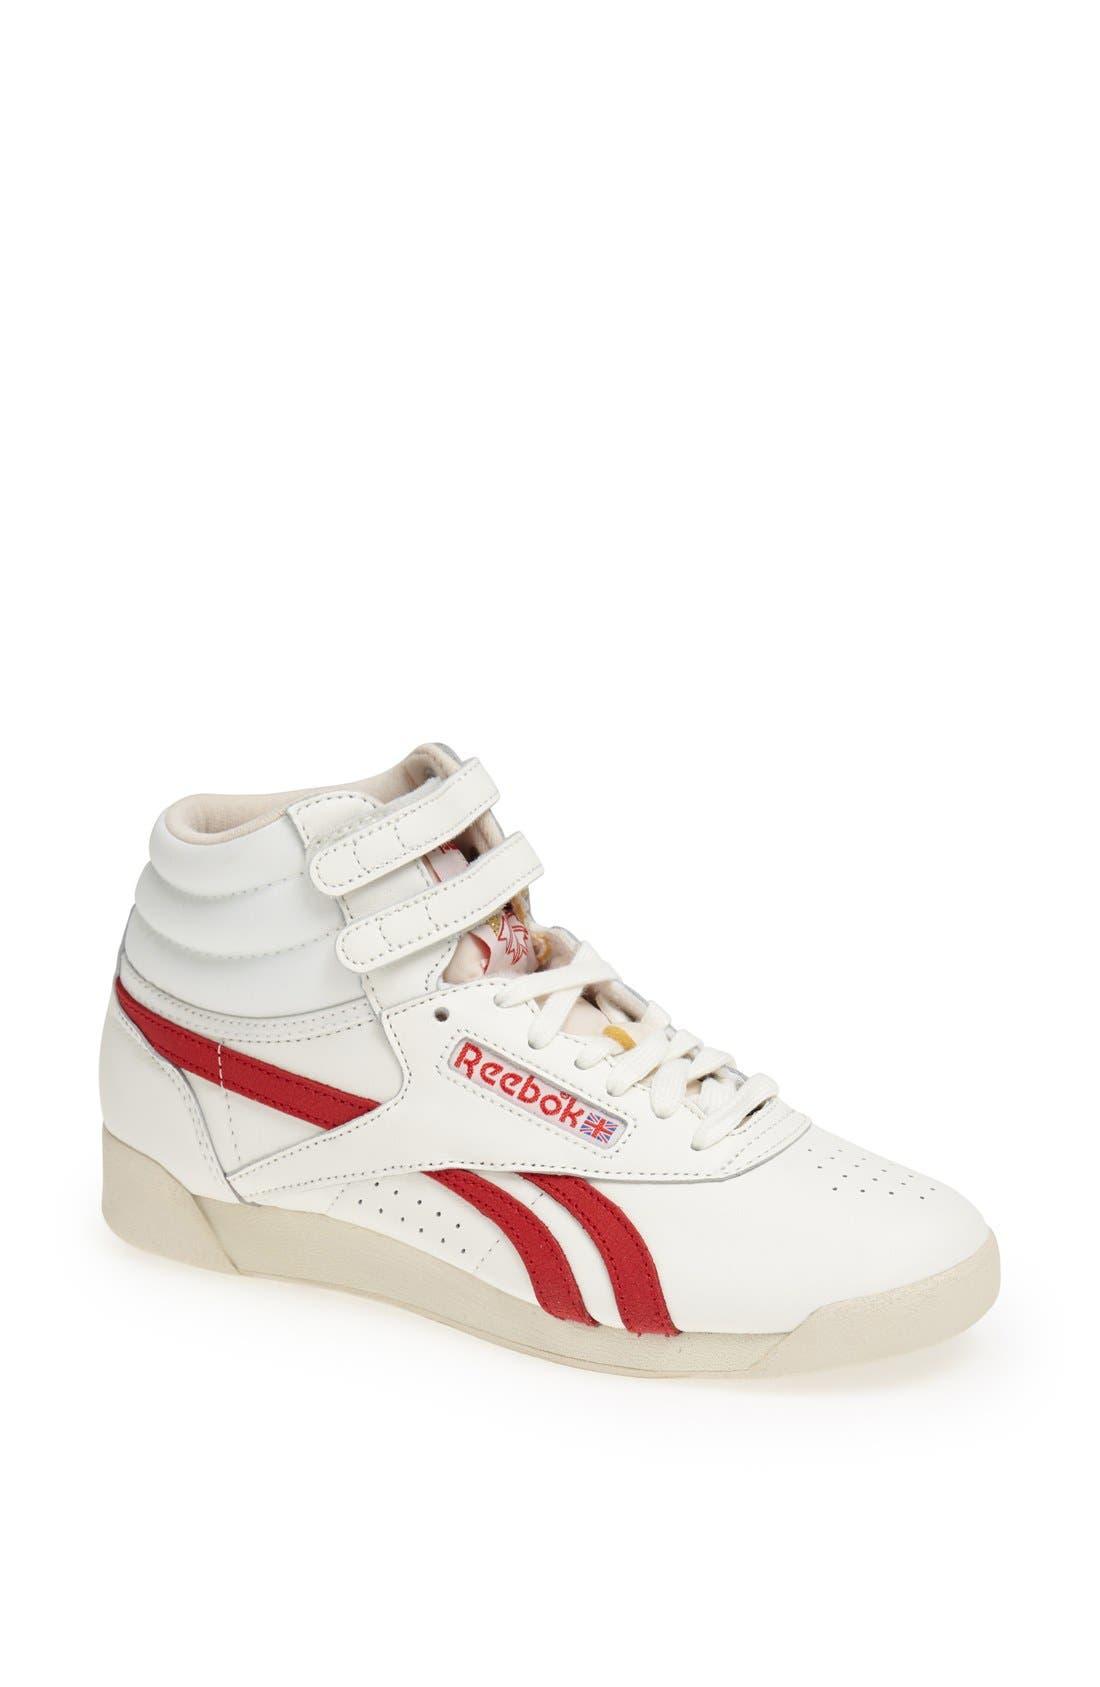 Alternate Image 1 Selected - Reebok 'Freestyle Hi - Vintage' Sneaker (Women)